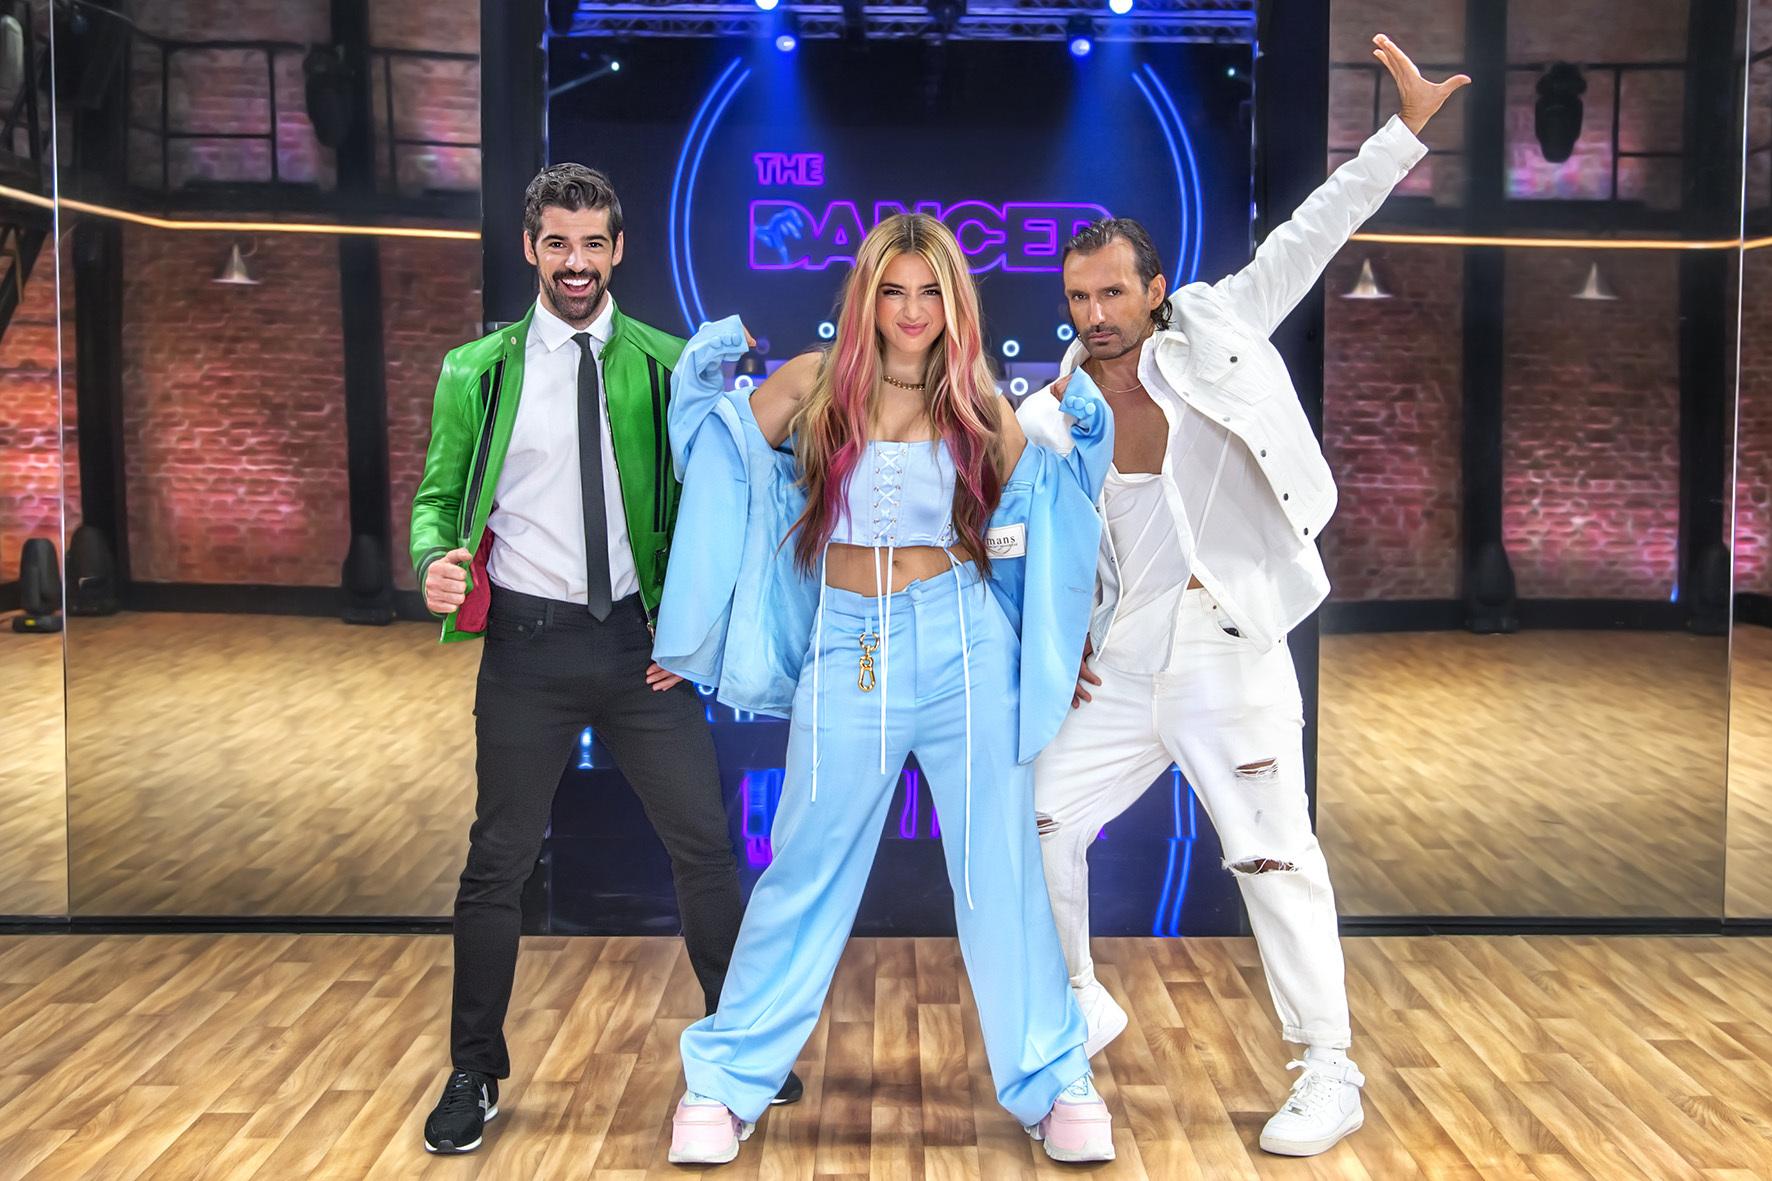 Miguel Ángel Muñoz, Lola Índigo y Rafa Méndez, jurado de 'The Dancer'